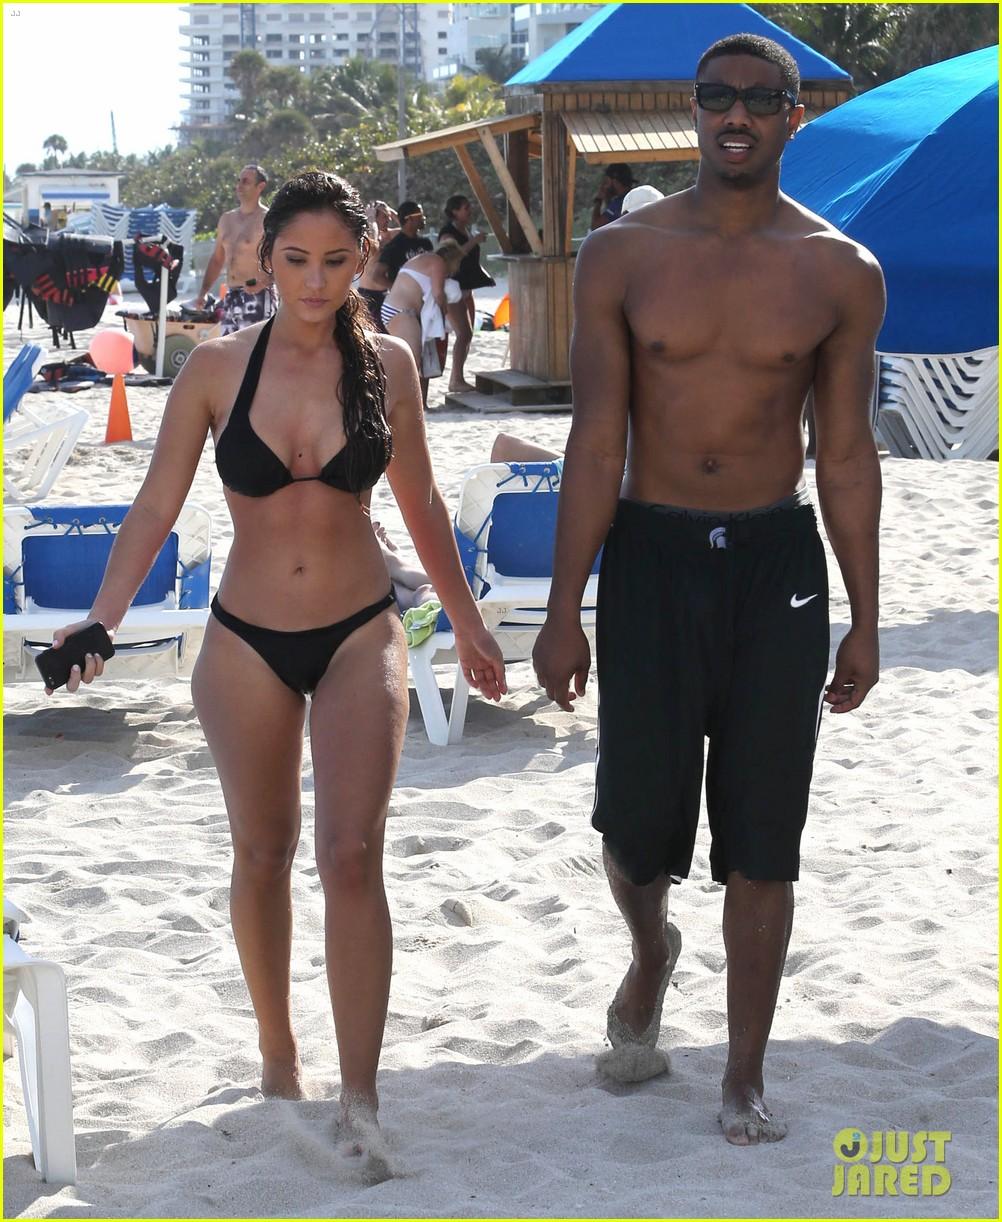 Michael B Jordan Shirtless Beach Stroll With Mystery Girl Photo